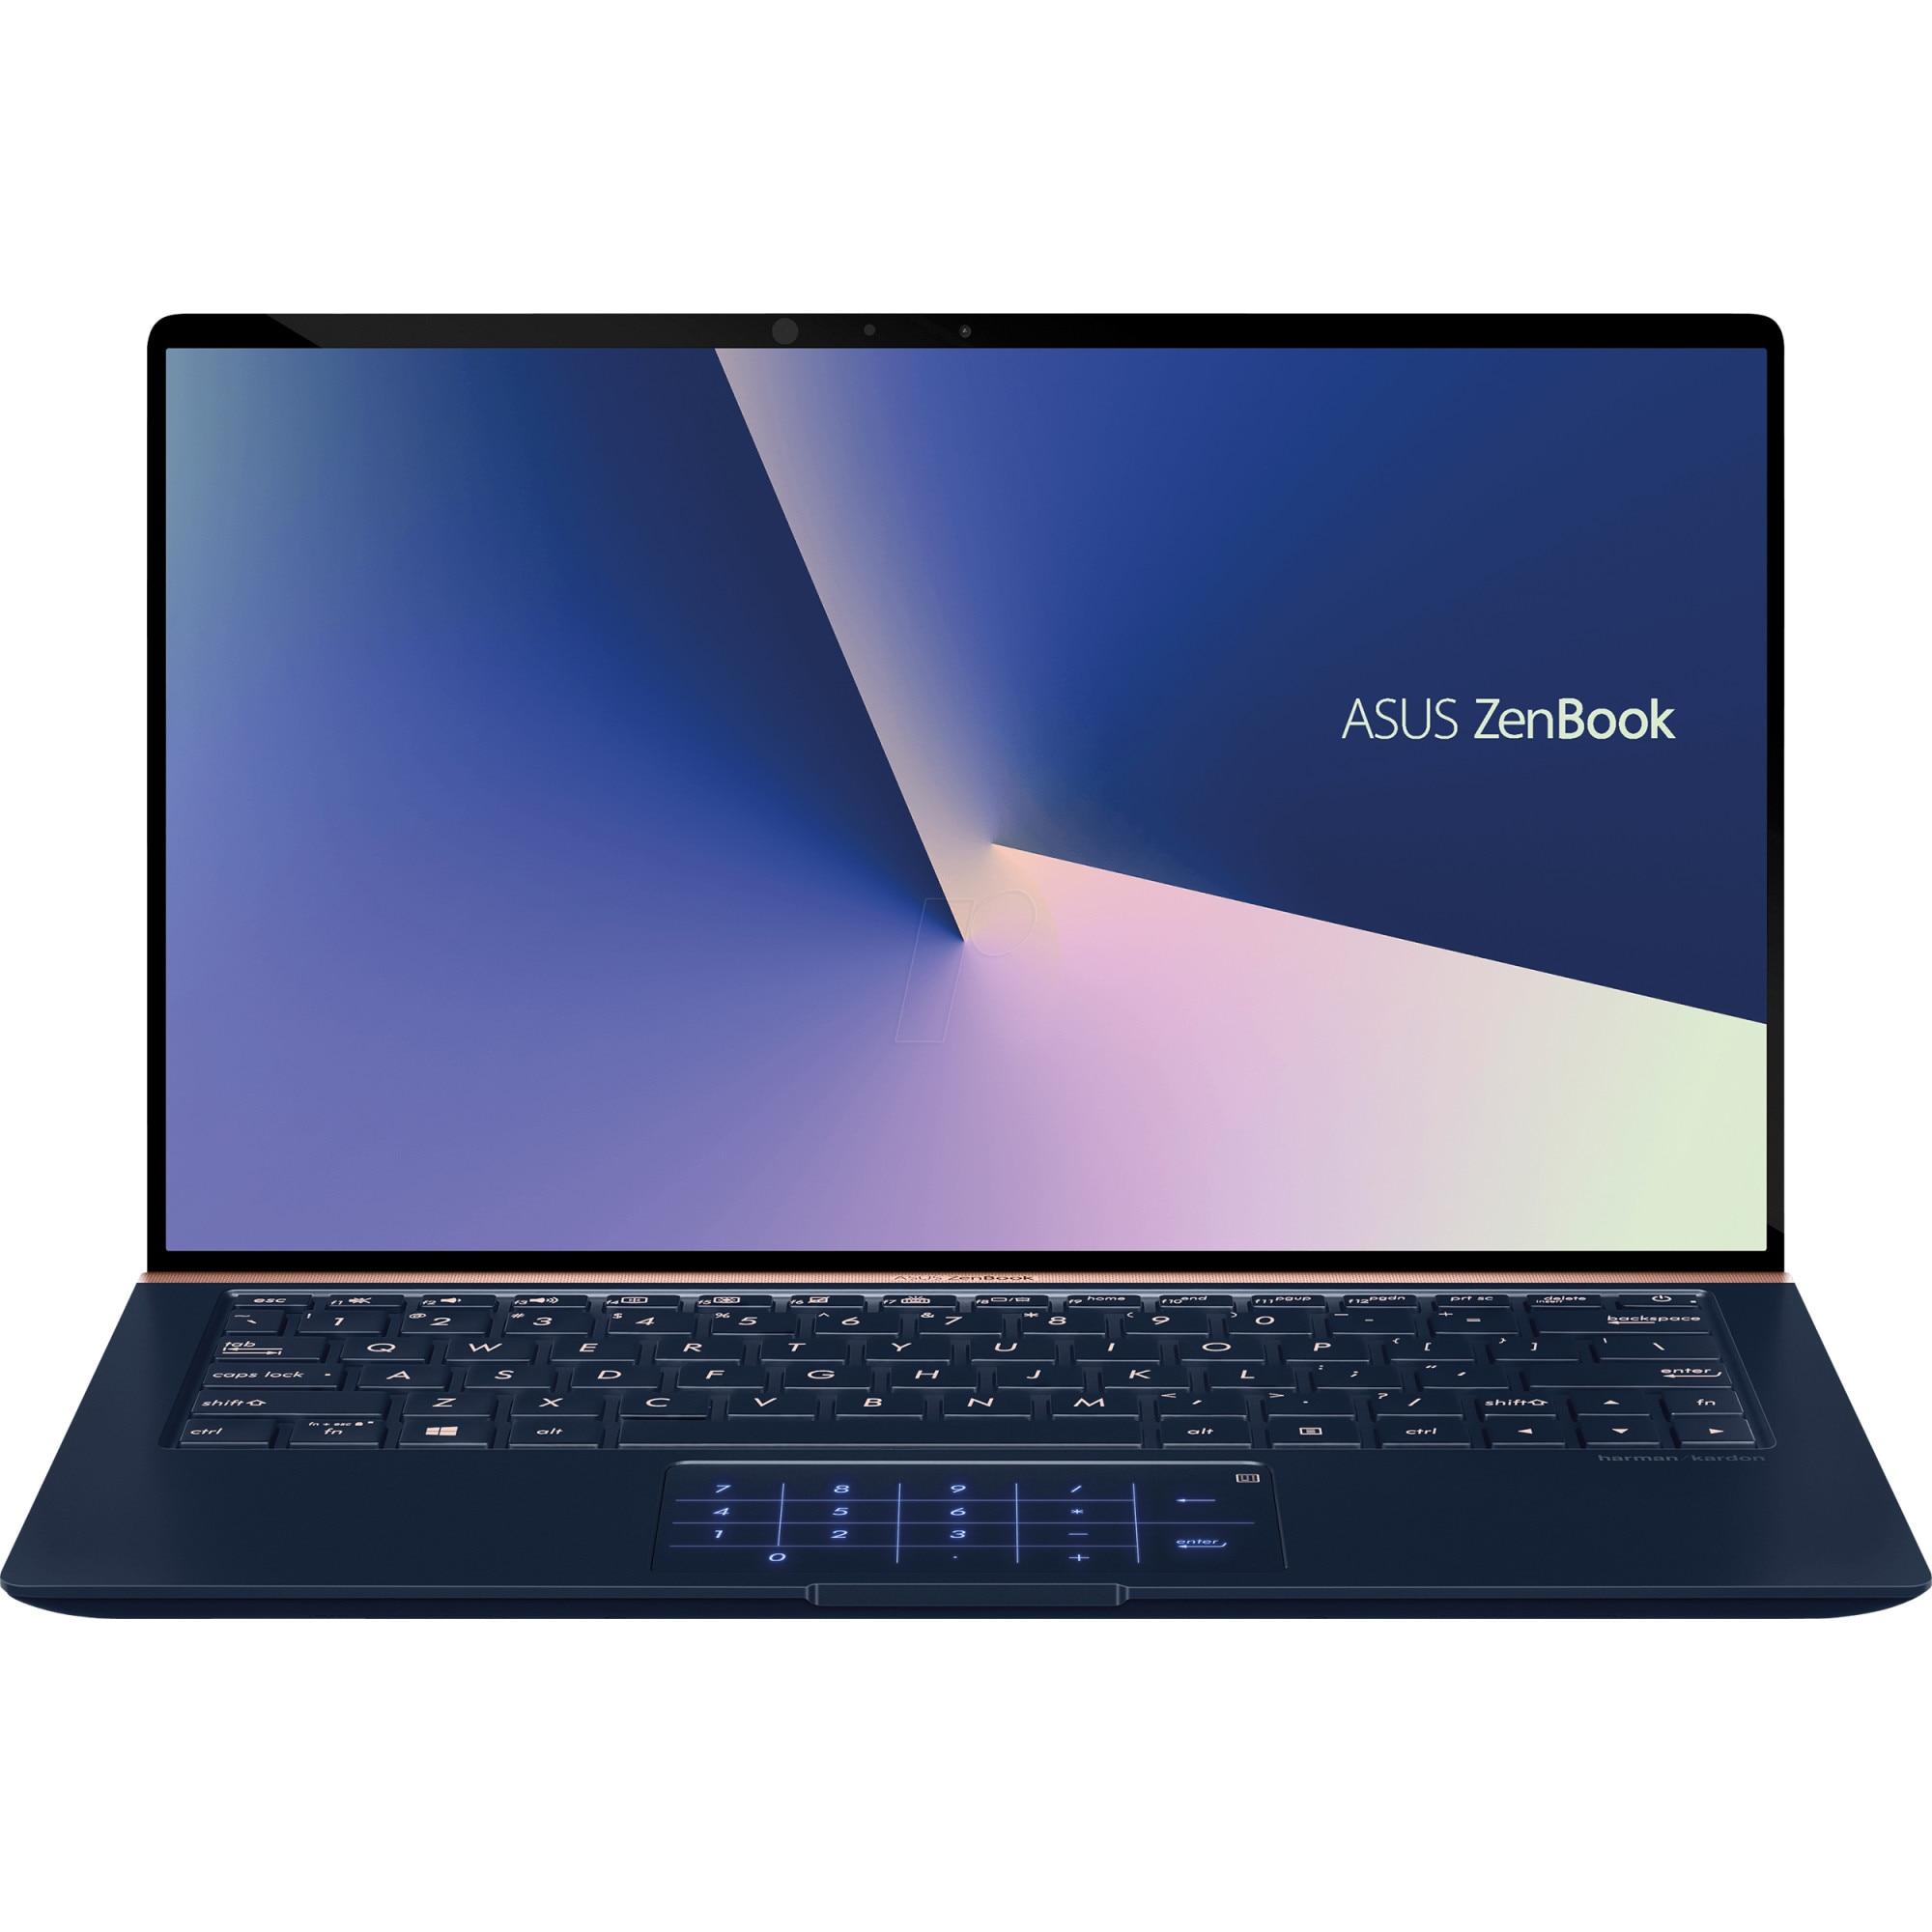 "Fotografie Laptop ultraportabil ASUS ZenBook 13 UX333FN cu procesor Intel® Core™ i7-8565U pana la 4.60 GHz, Whiskey Lake, 13.3"", Full HD, 16GB, 512GB SSD, NVIDIA GeForce MX150 2GB, Endless OS, Royal Blue"